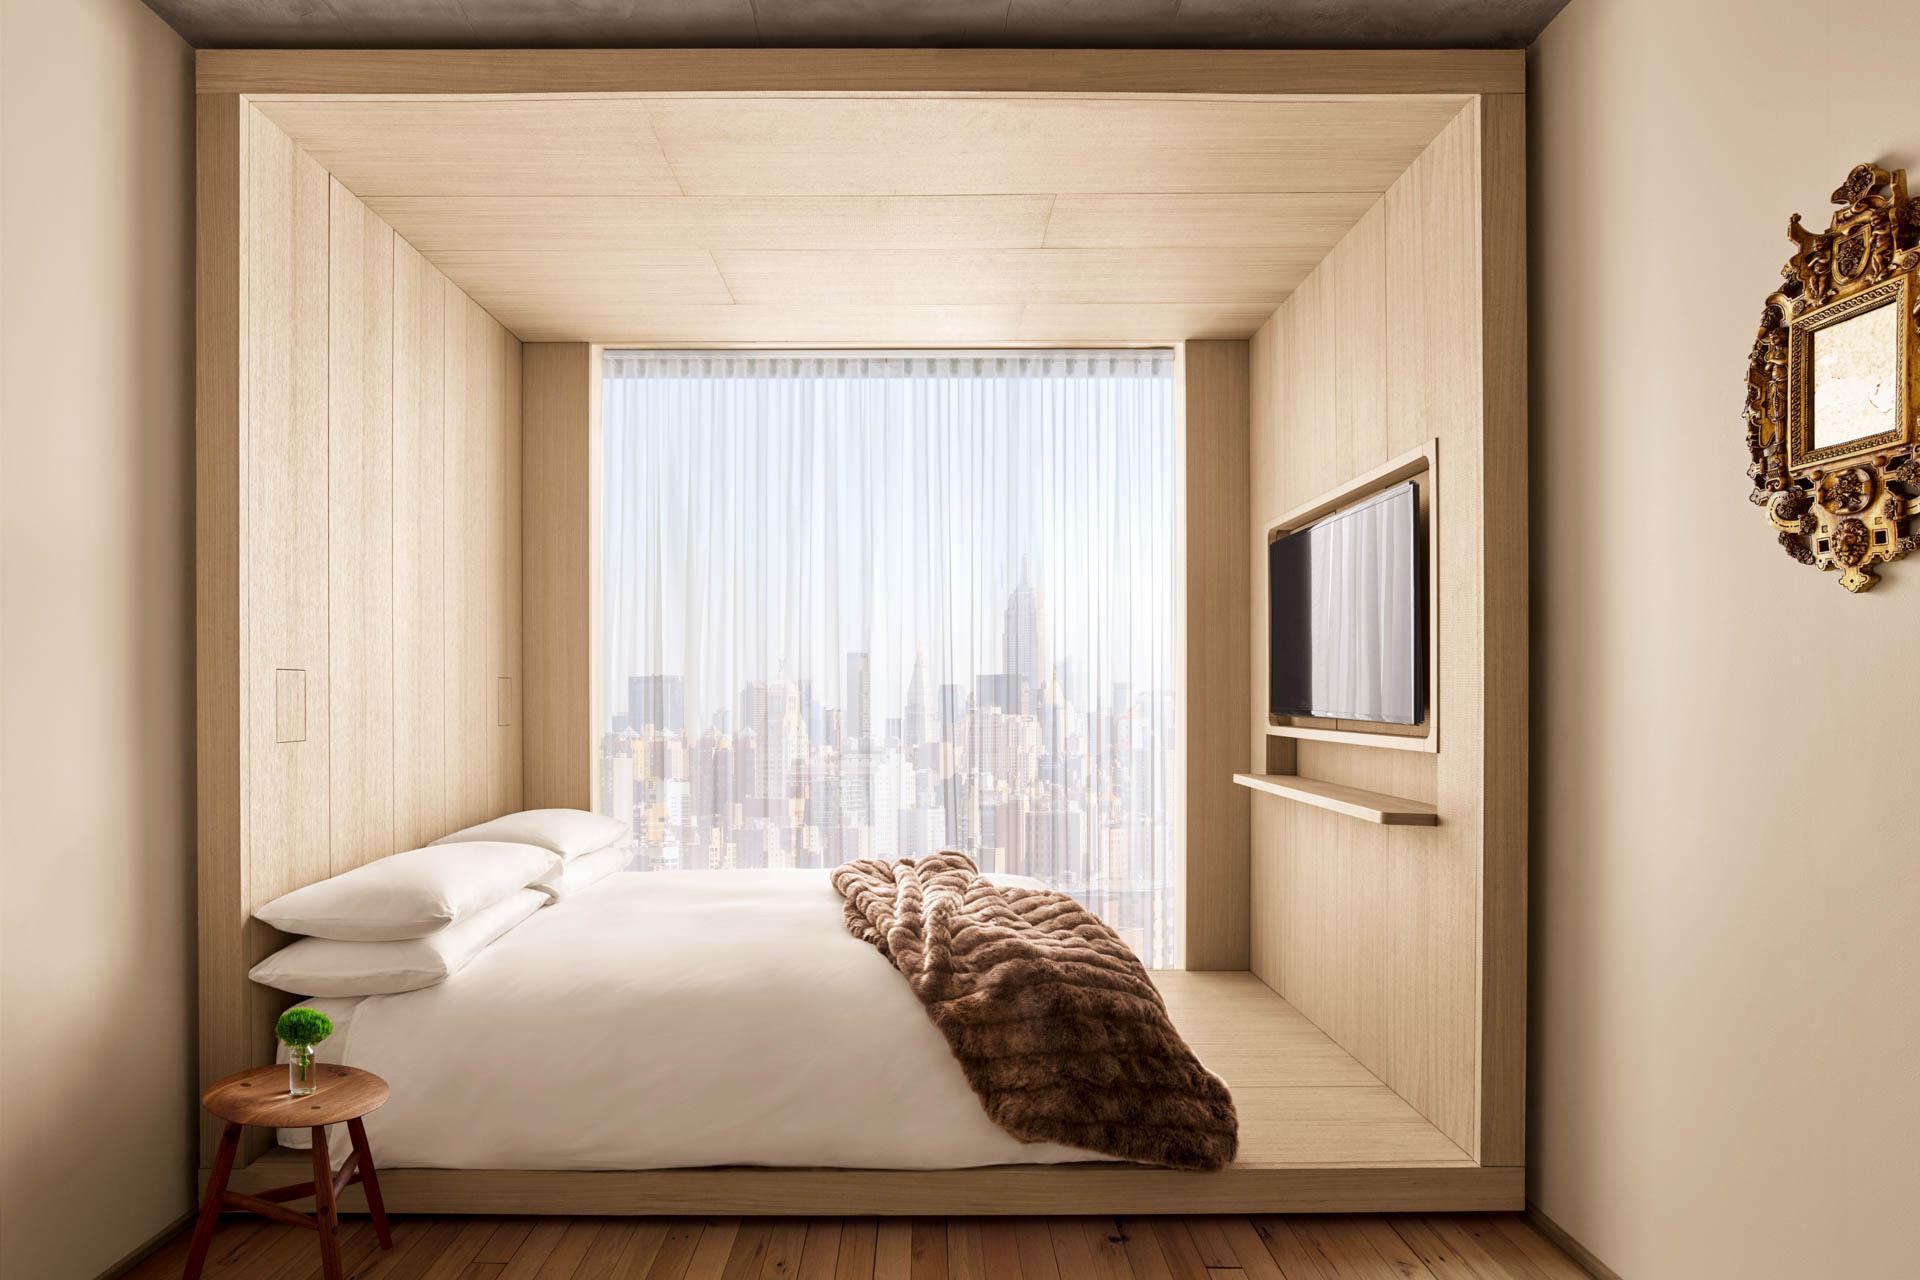 06-PUBLIC Hotel New York City - Queen - © Nicholas Koenig (1).jpg